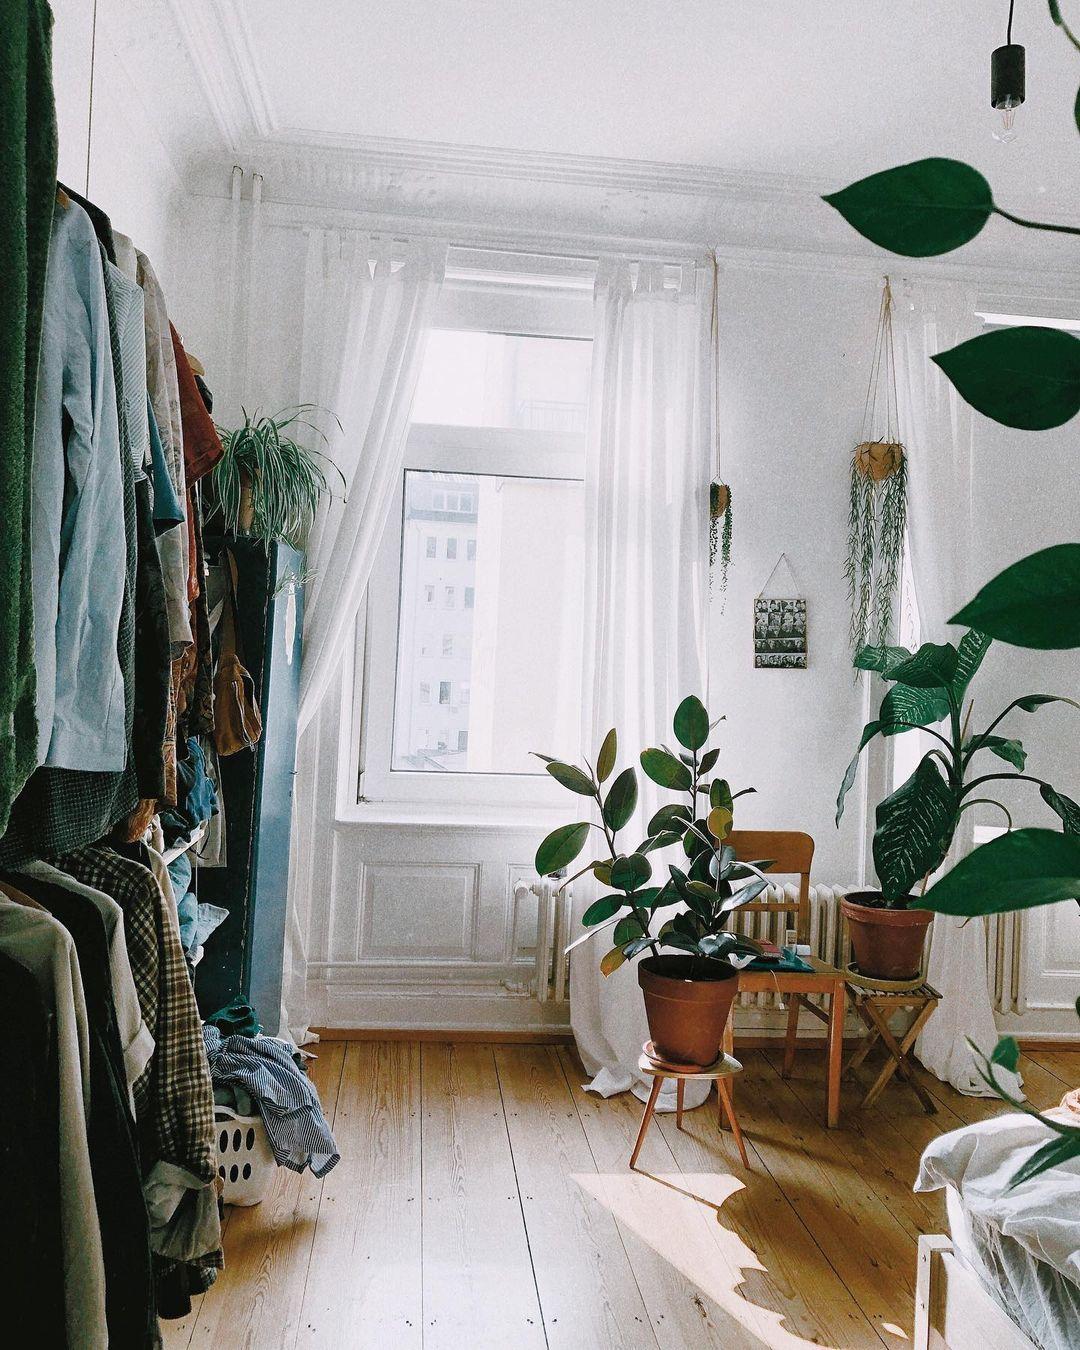 "Rigmor 🌈 on Instagram: ""Sonnenstunde. @my.bdrm #sunnyday #sunshine #interiorinspo #interior_design #homeinspiration #mybdrm #plantslover #plantsathome…"""